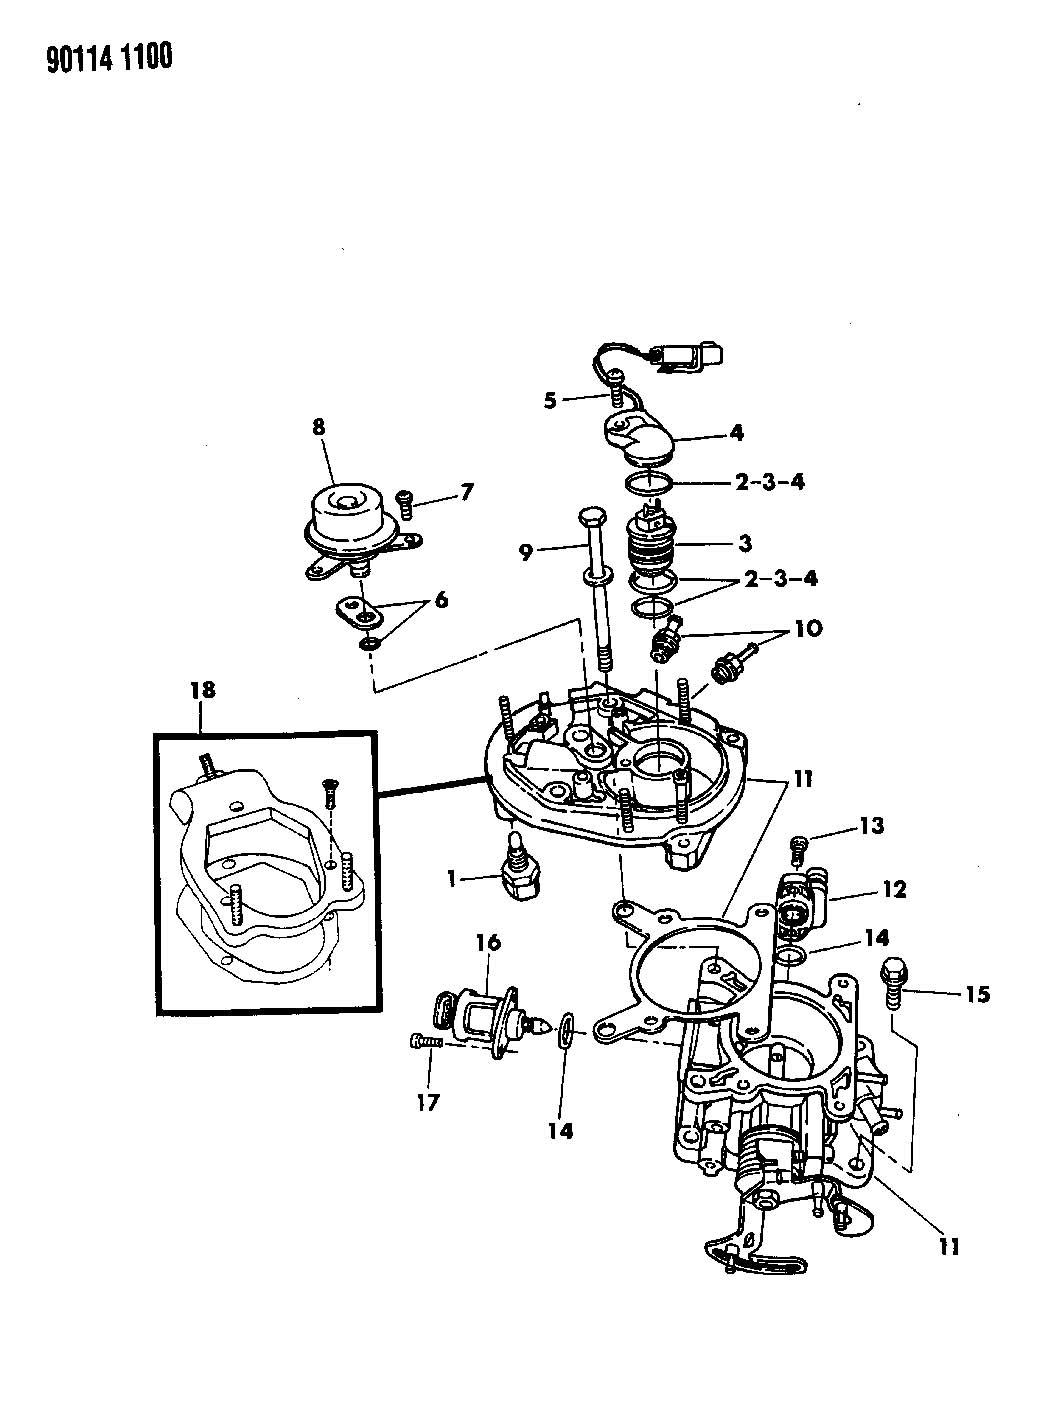 Dodge Shadow Motor A I S Body Engine Throttle